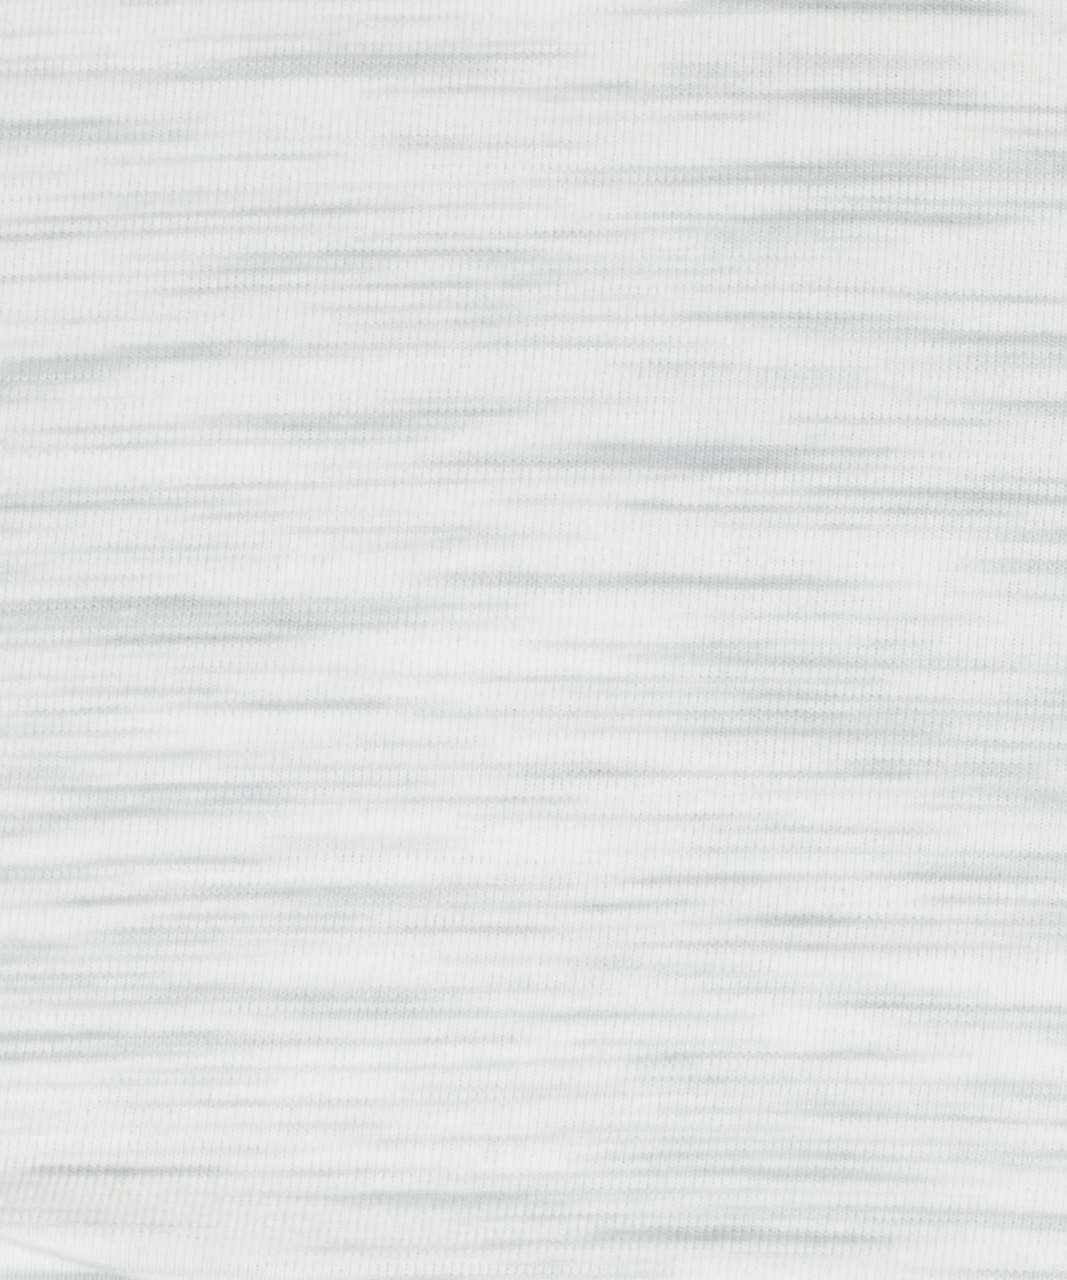 Lululemon Back In Action Long Sleeve - 3 Colour Space Dye Ice Grey Alpine White